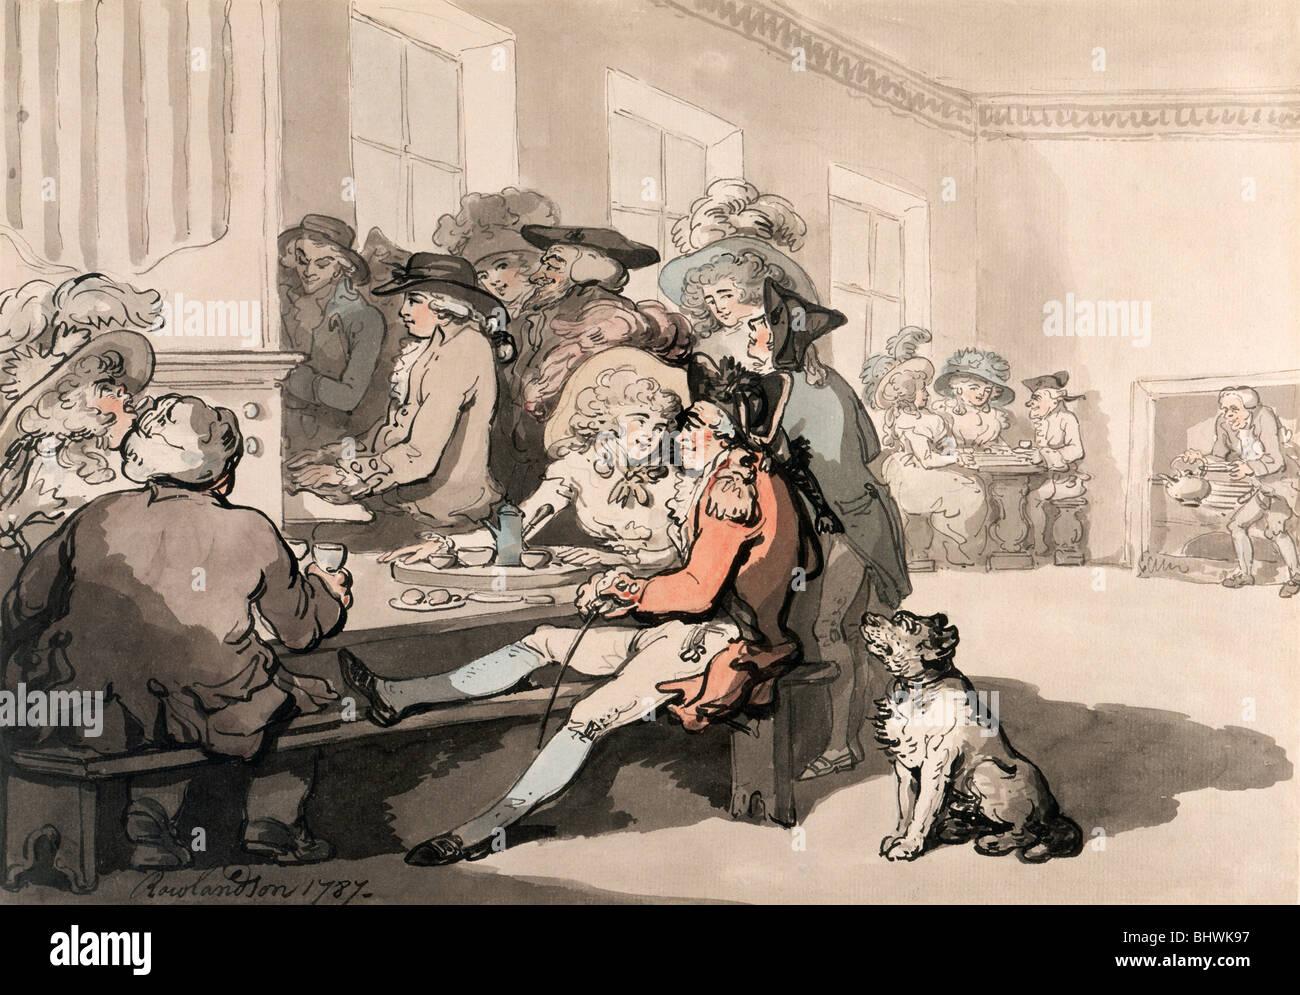 The Chocolate House 1787 Artist Thomas Rowlandson